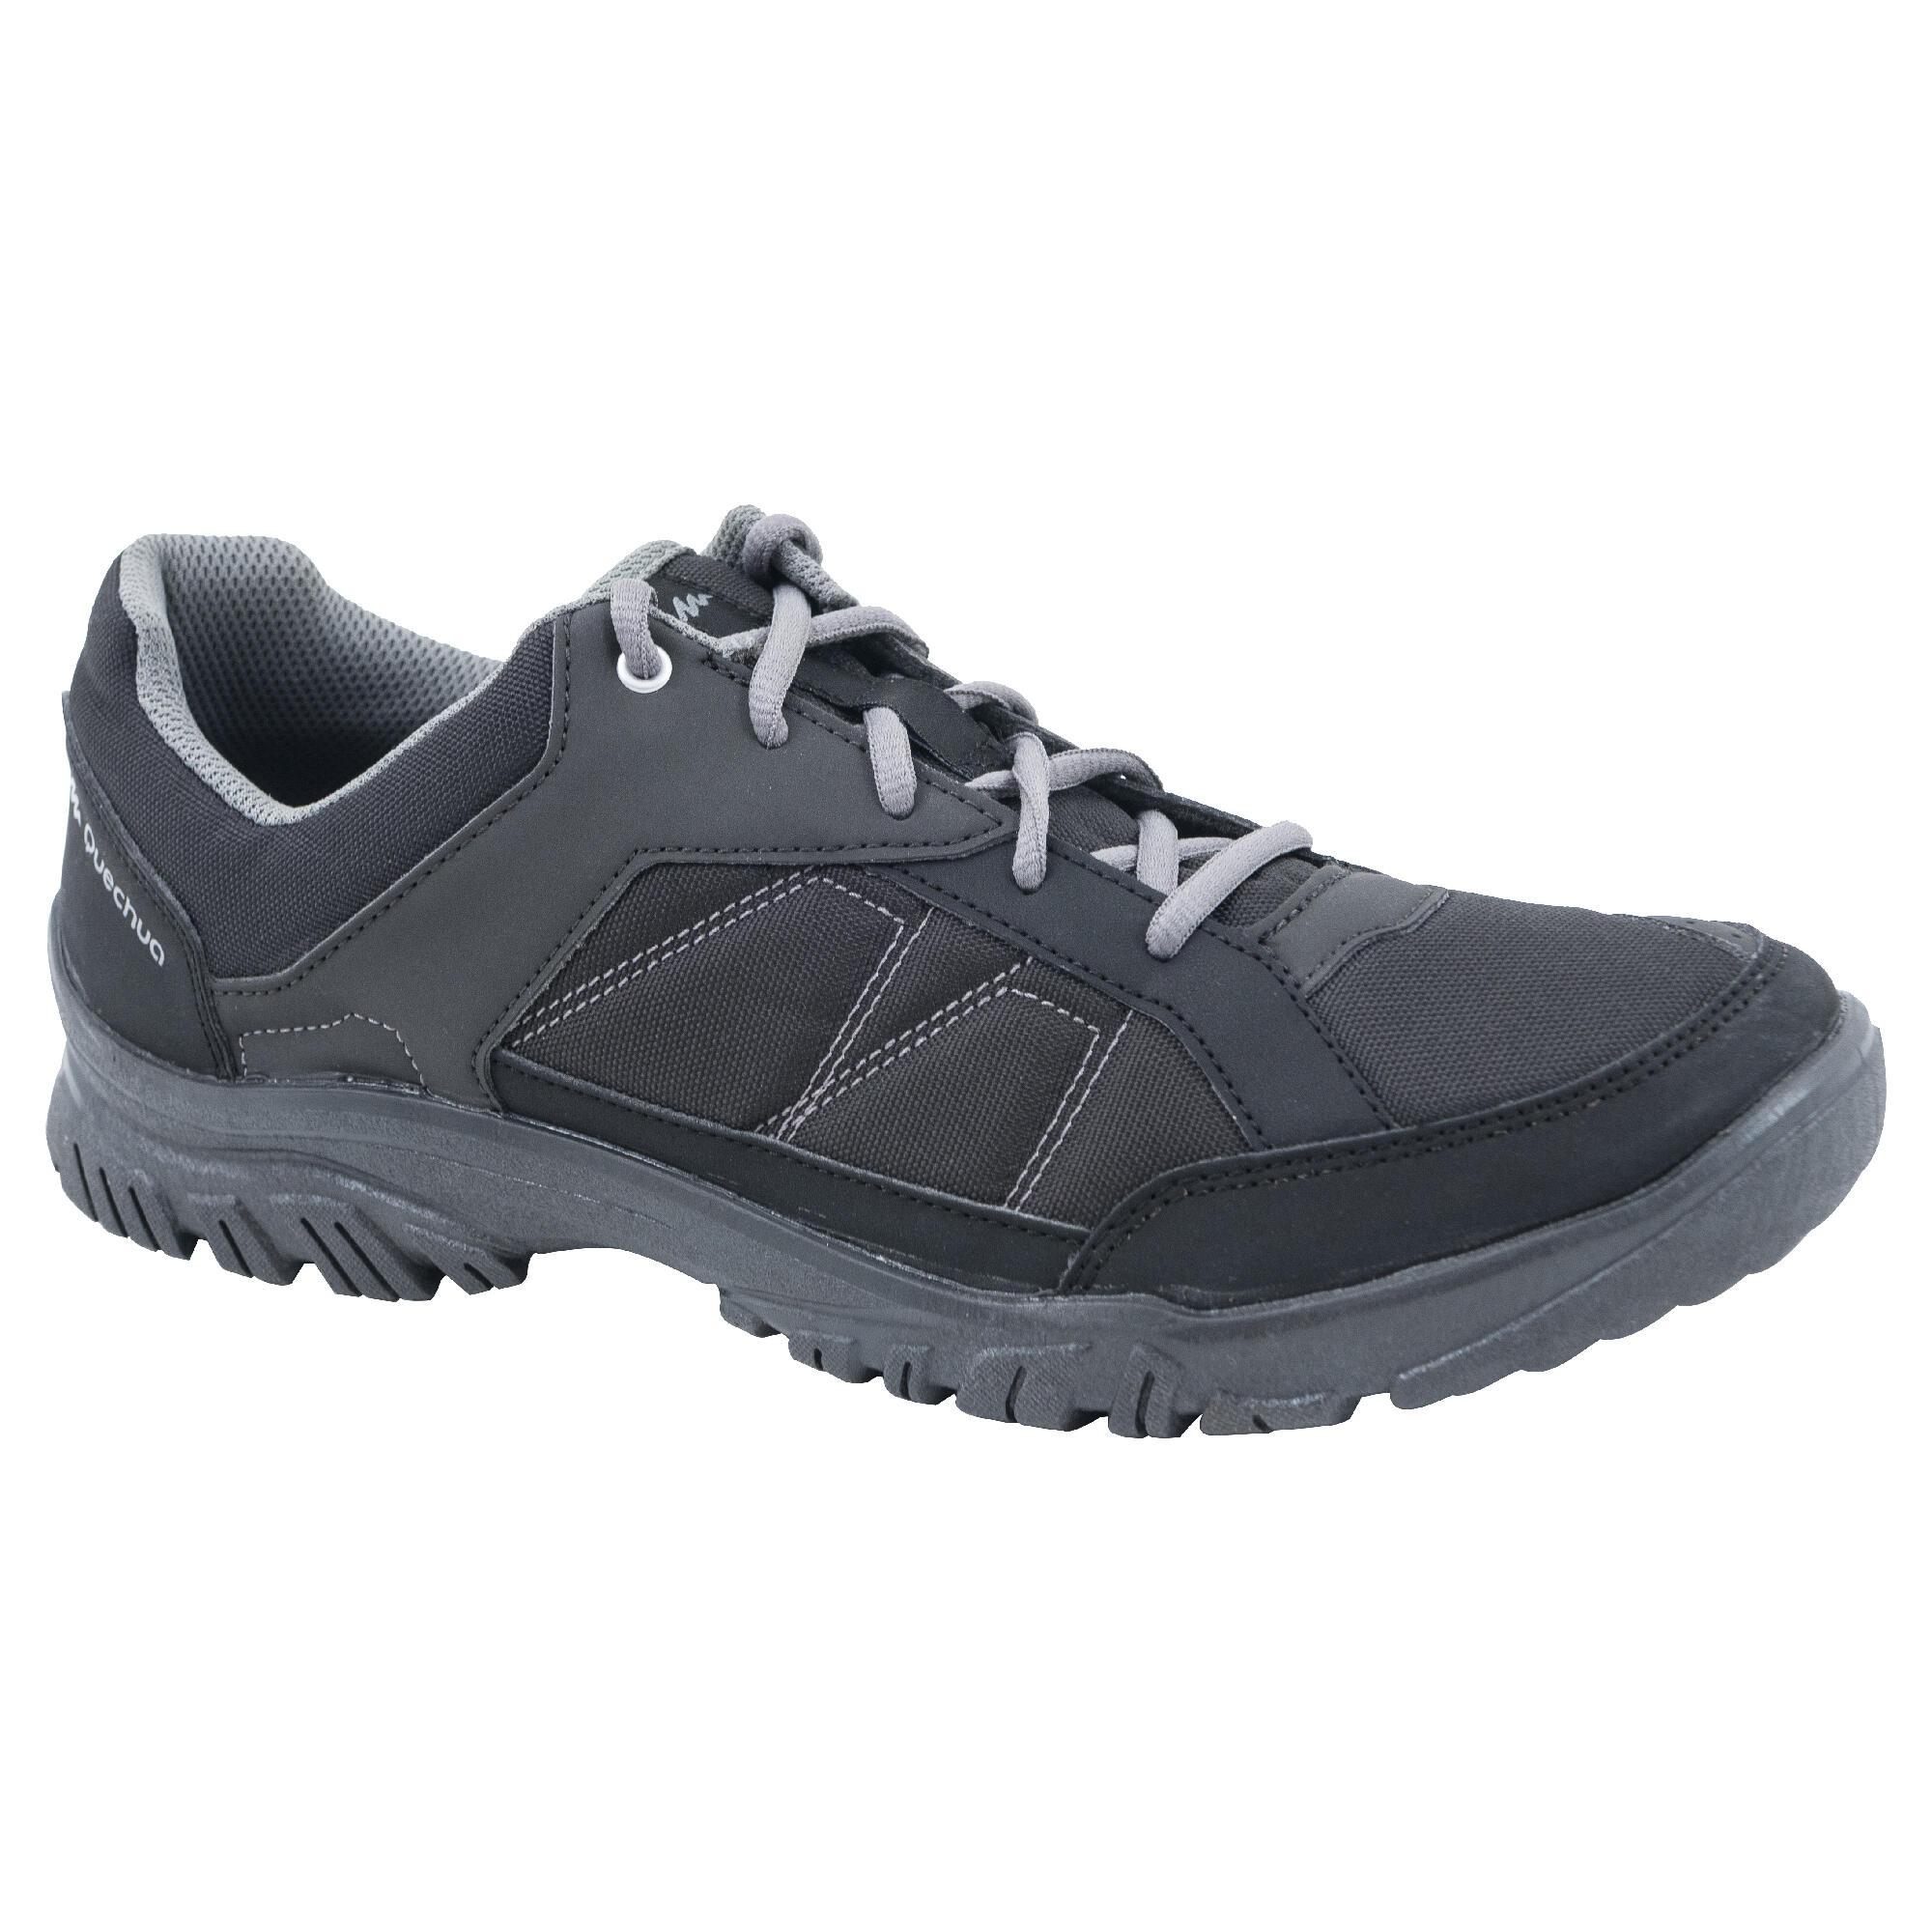 Arpenaz 50 Men's hiking shoes - Grey/Yellow